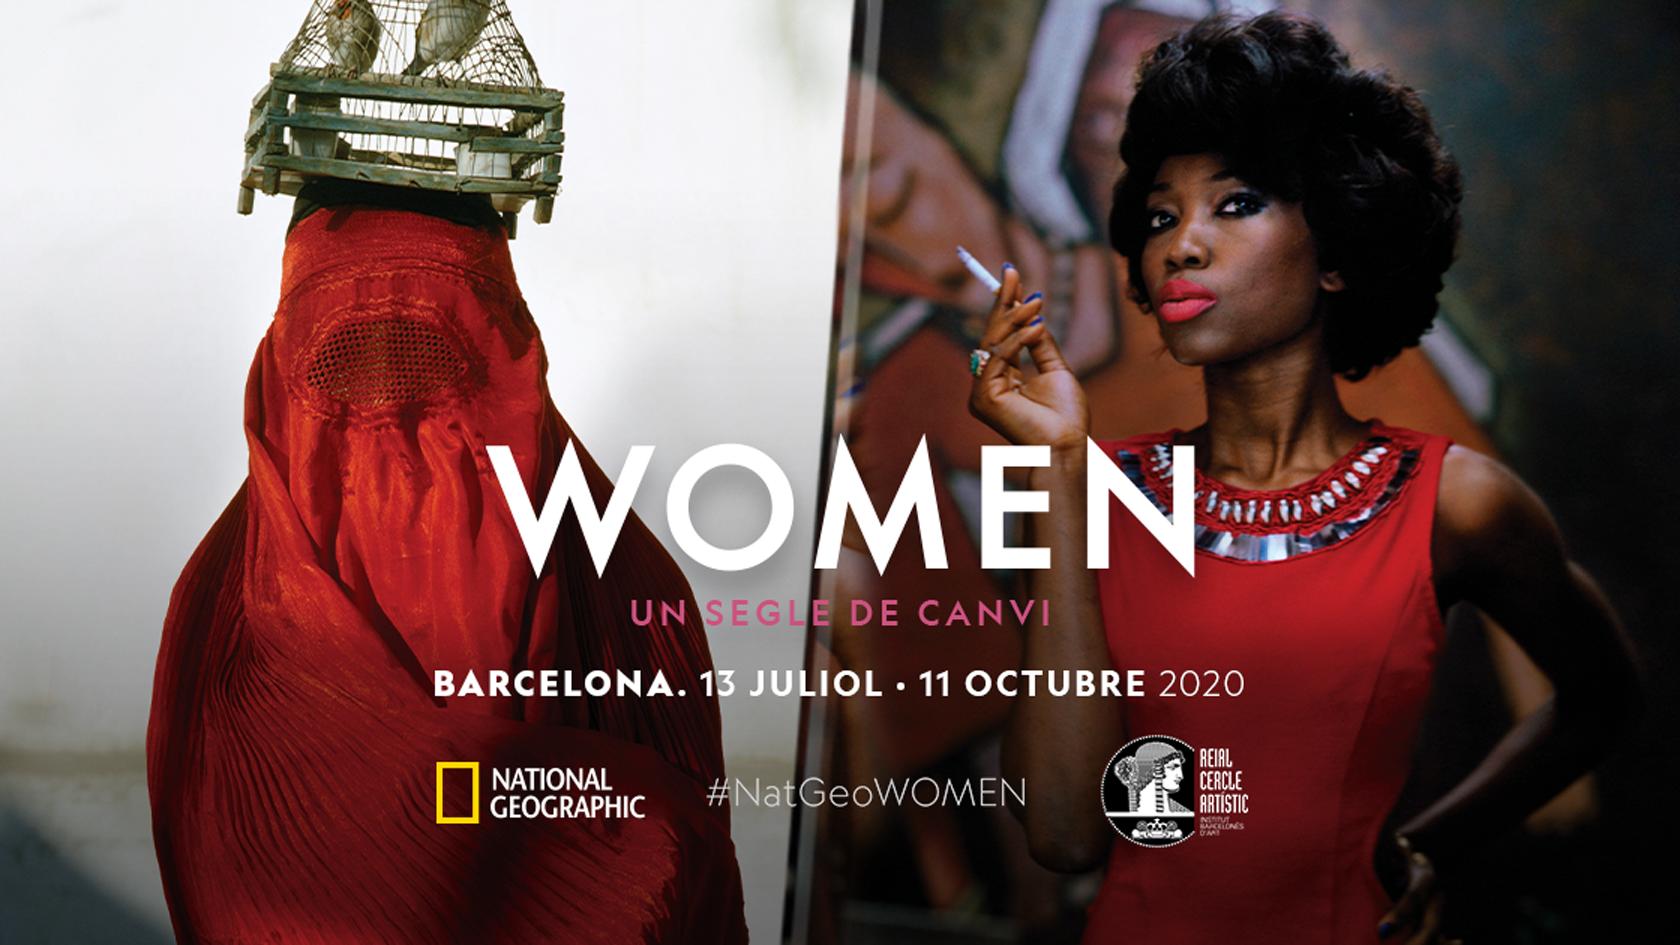 improrrogable-barcelona-exposiciones-reial-cercle-artistic-women-un-siglo-de-cambio-national-geographic